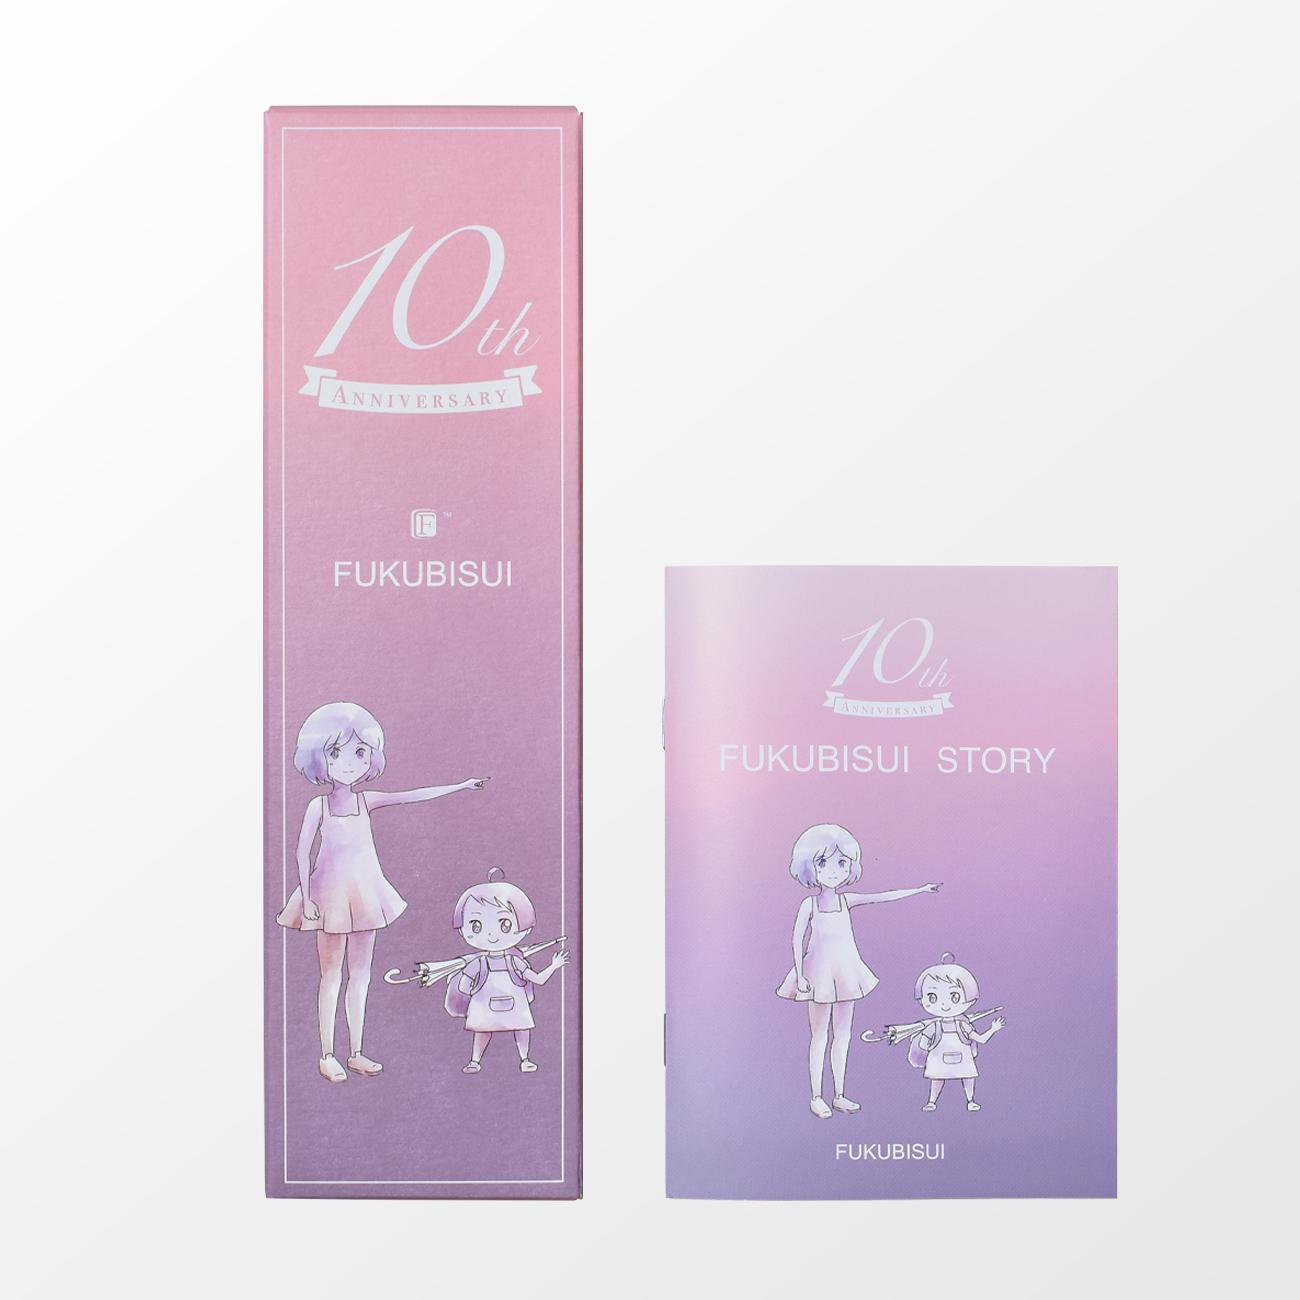 10th記念パッケージ入り FUKUBISUI500ml(FUKUBISUI STORY BOOK付き)